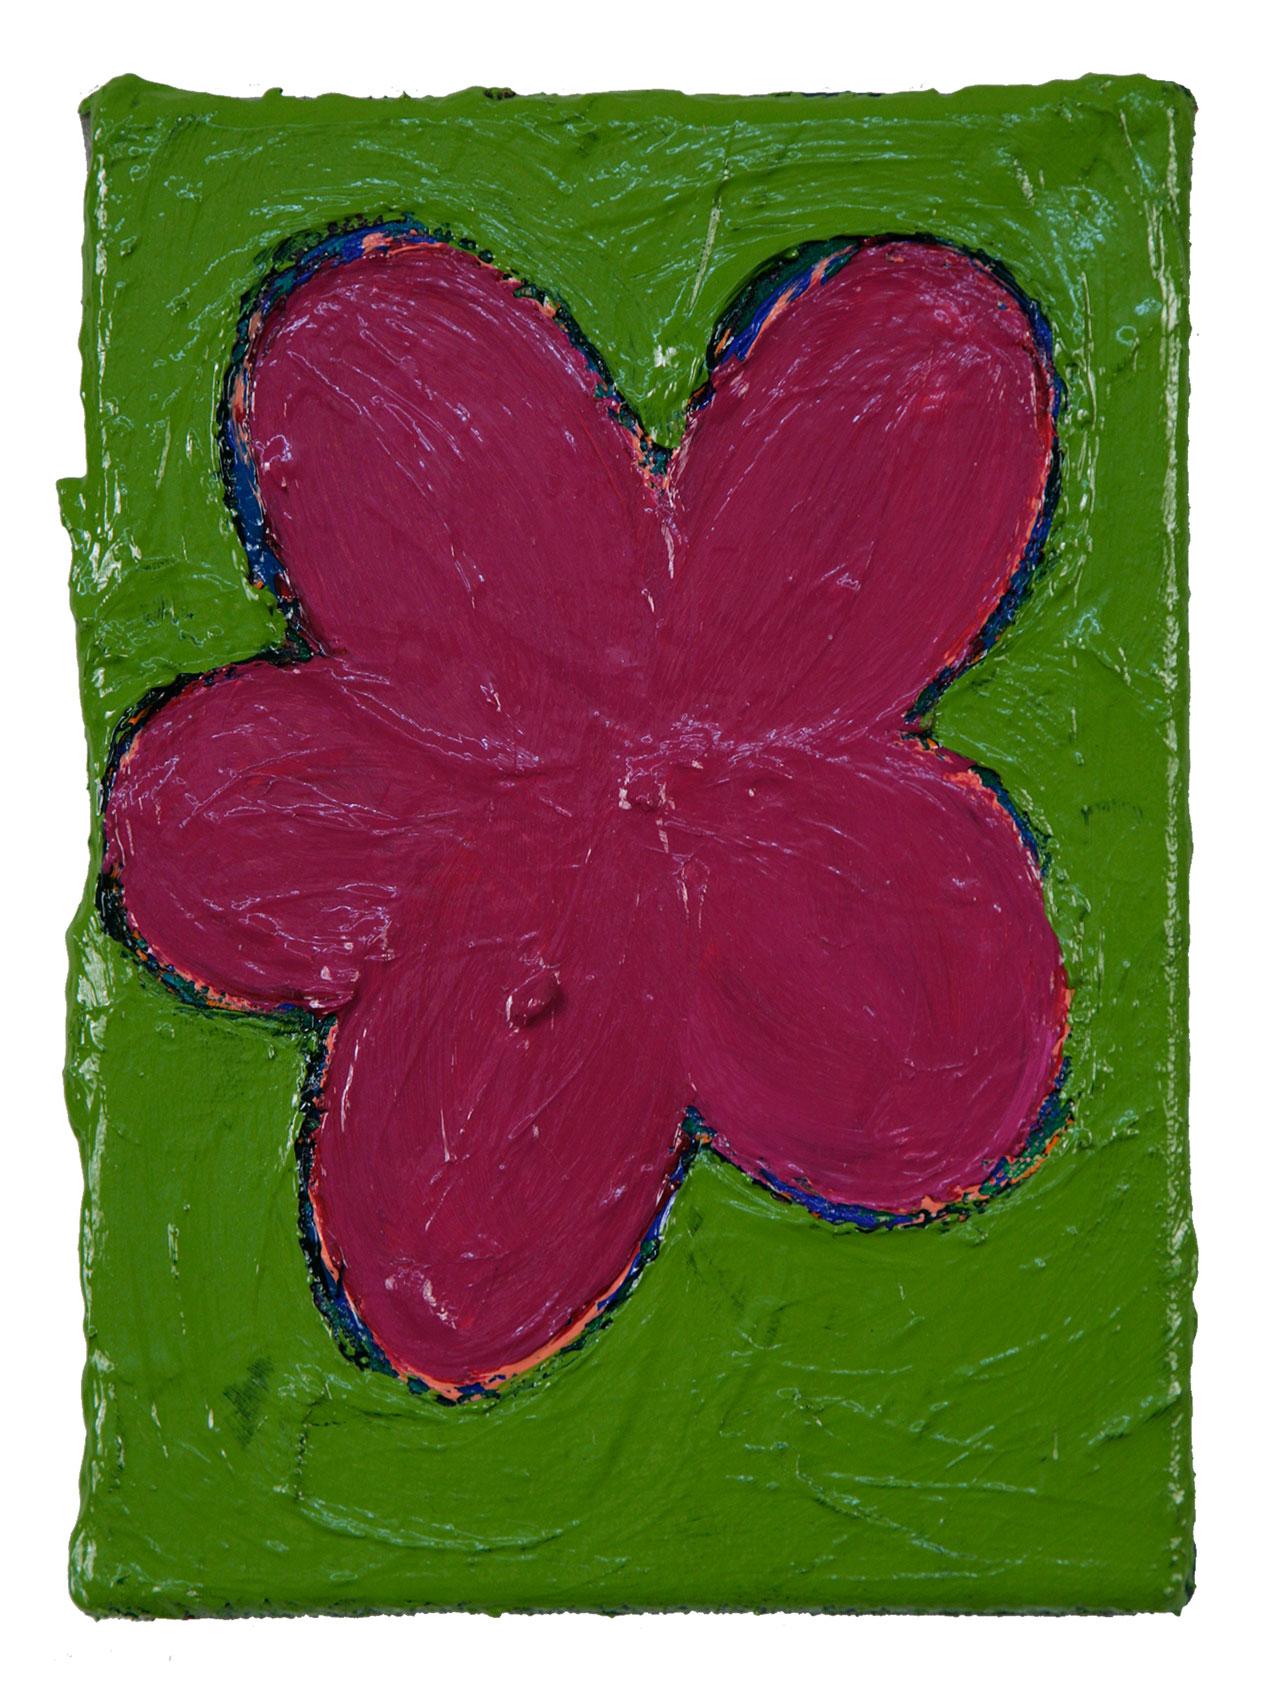 25 Flowers 9 | 2008 © Kerstin Jeckel | MEMORY-PROJEKT # extra